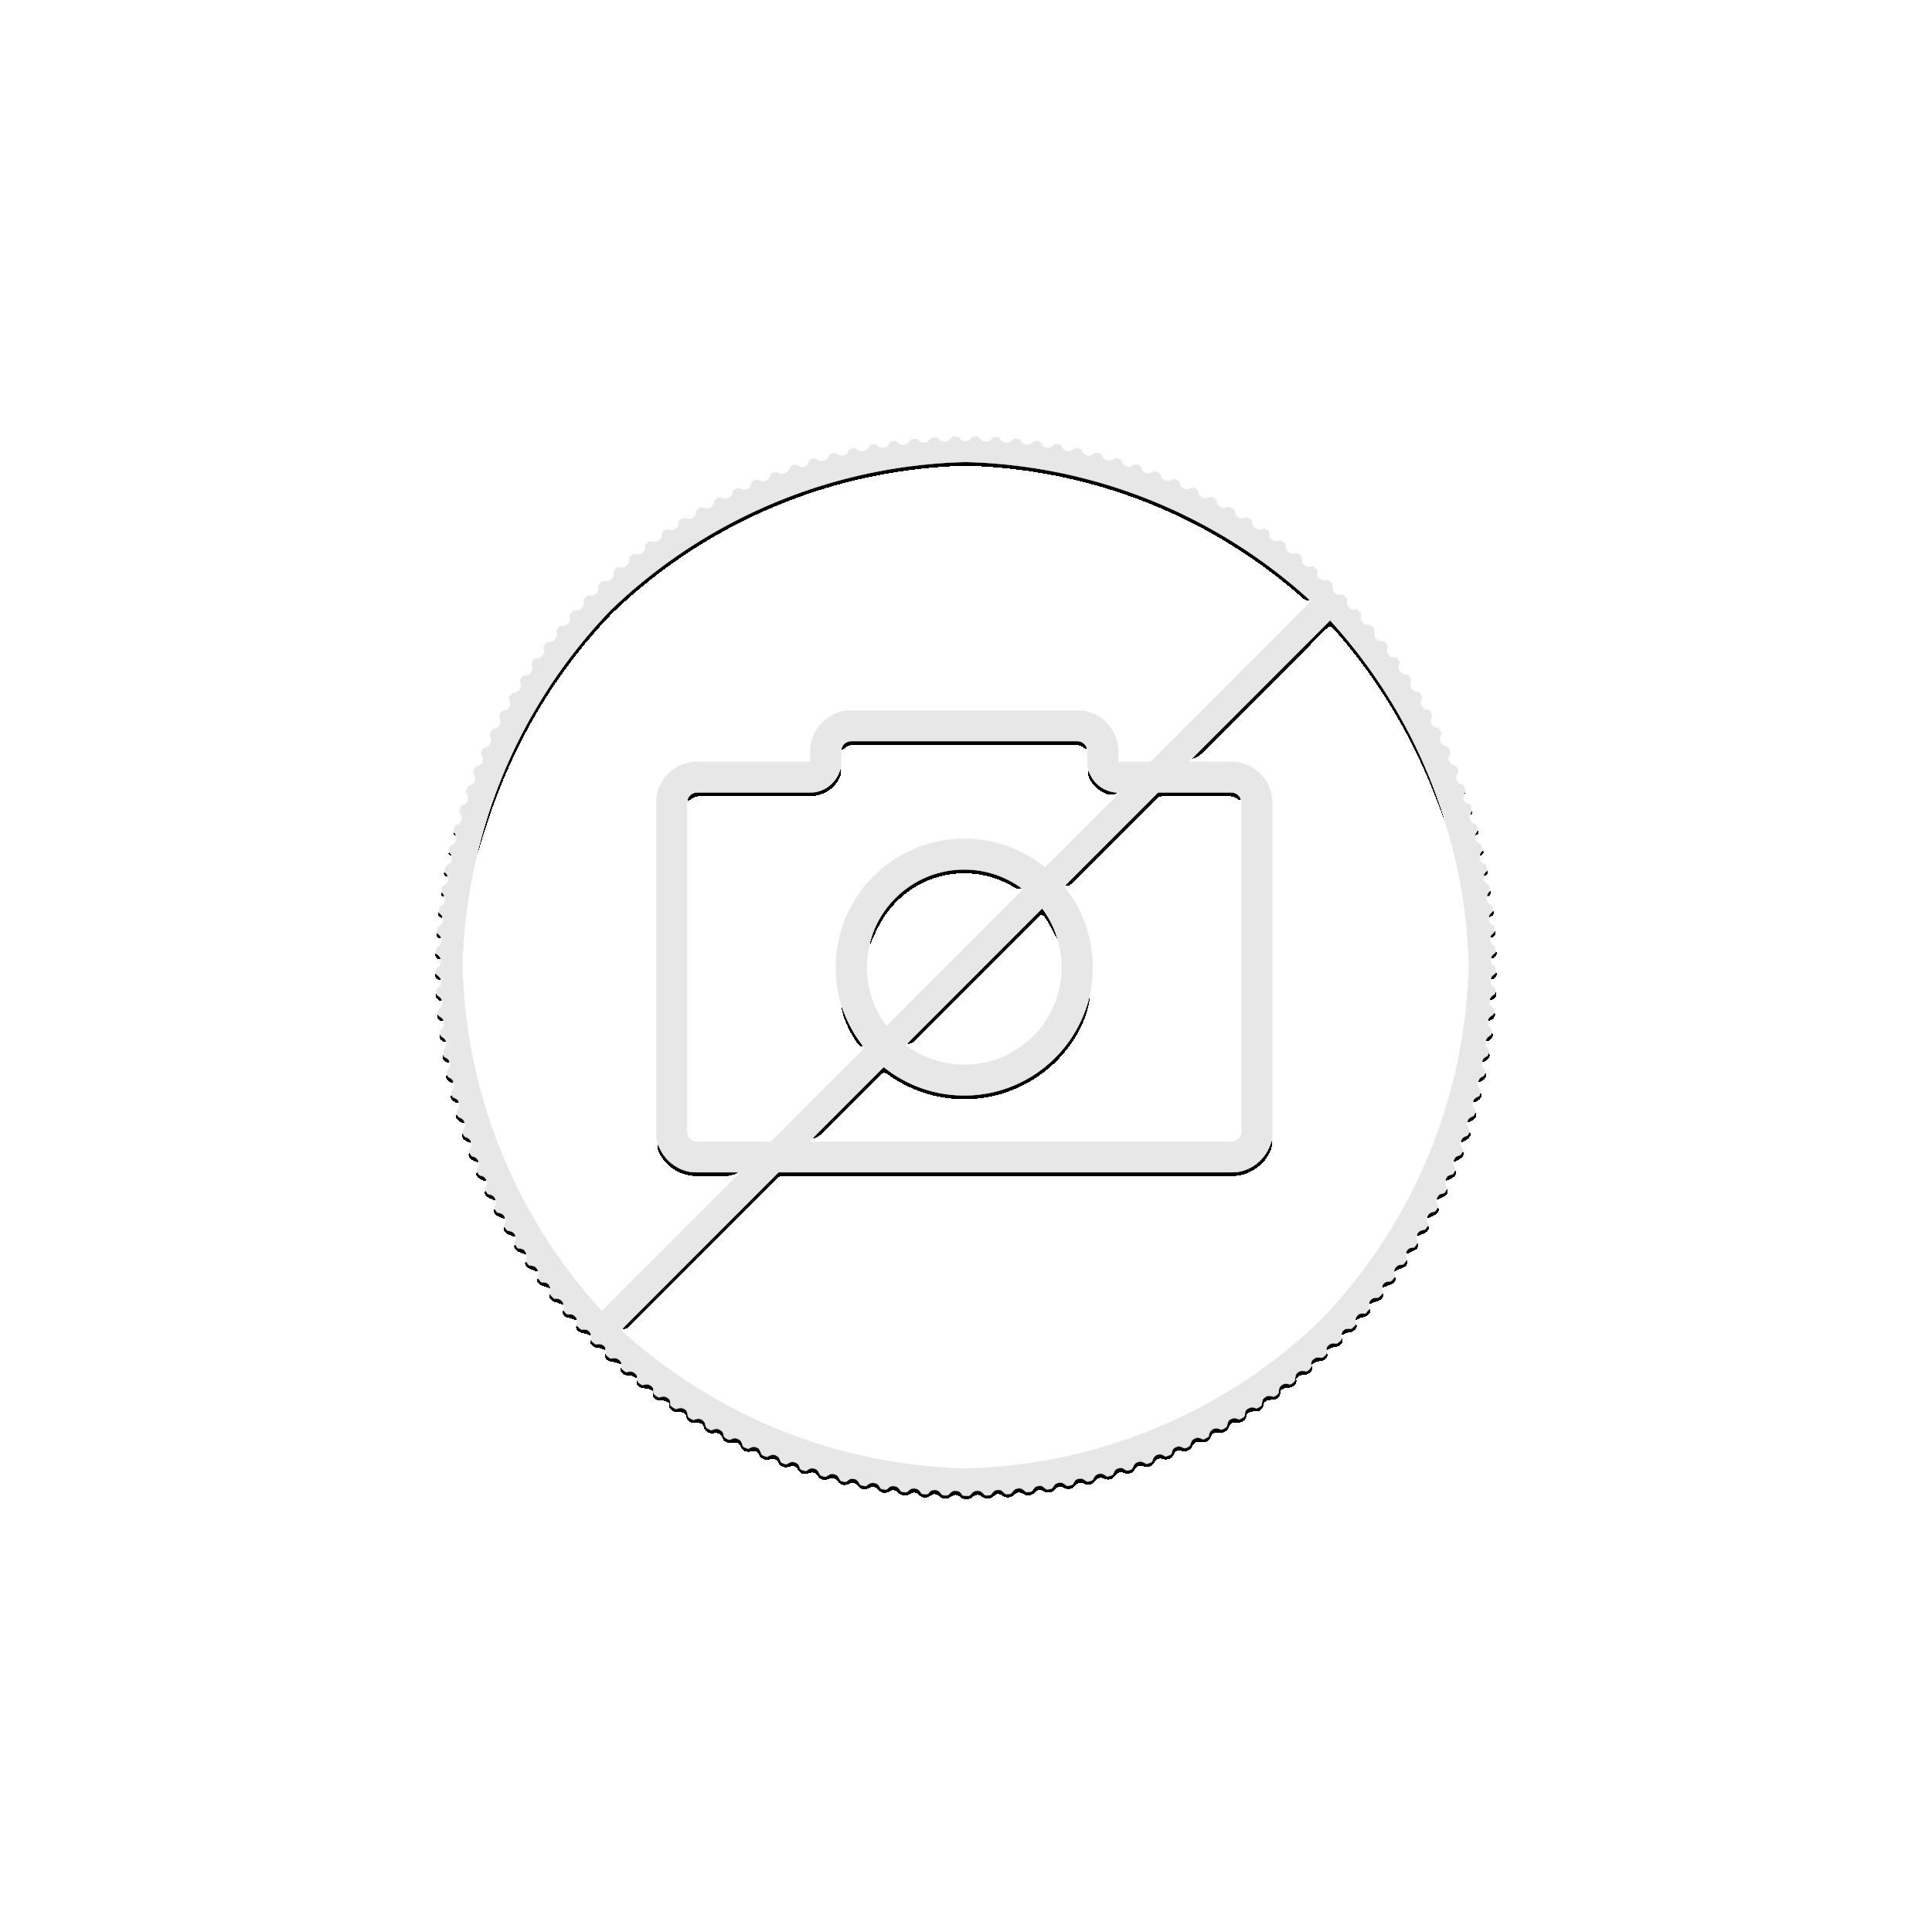 1 troy ounce zilveren munt dragon 2021